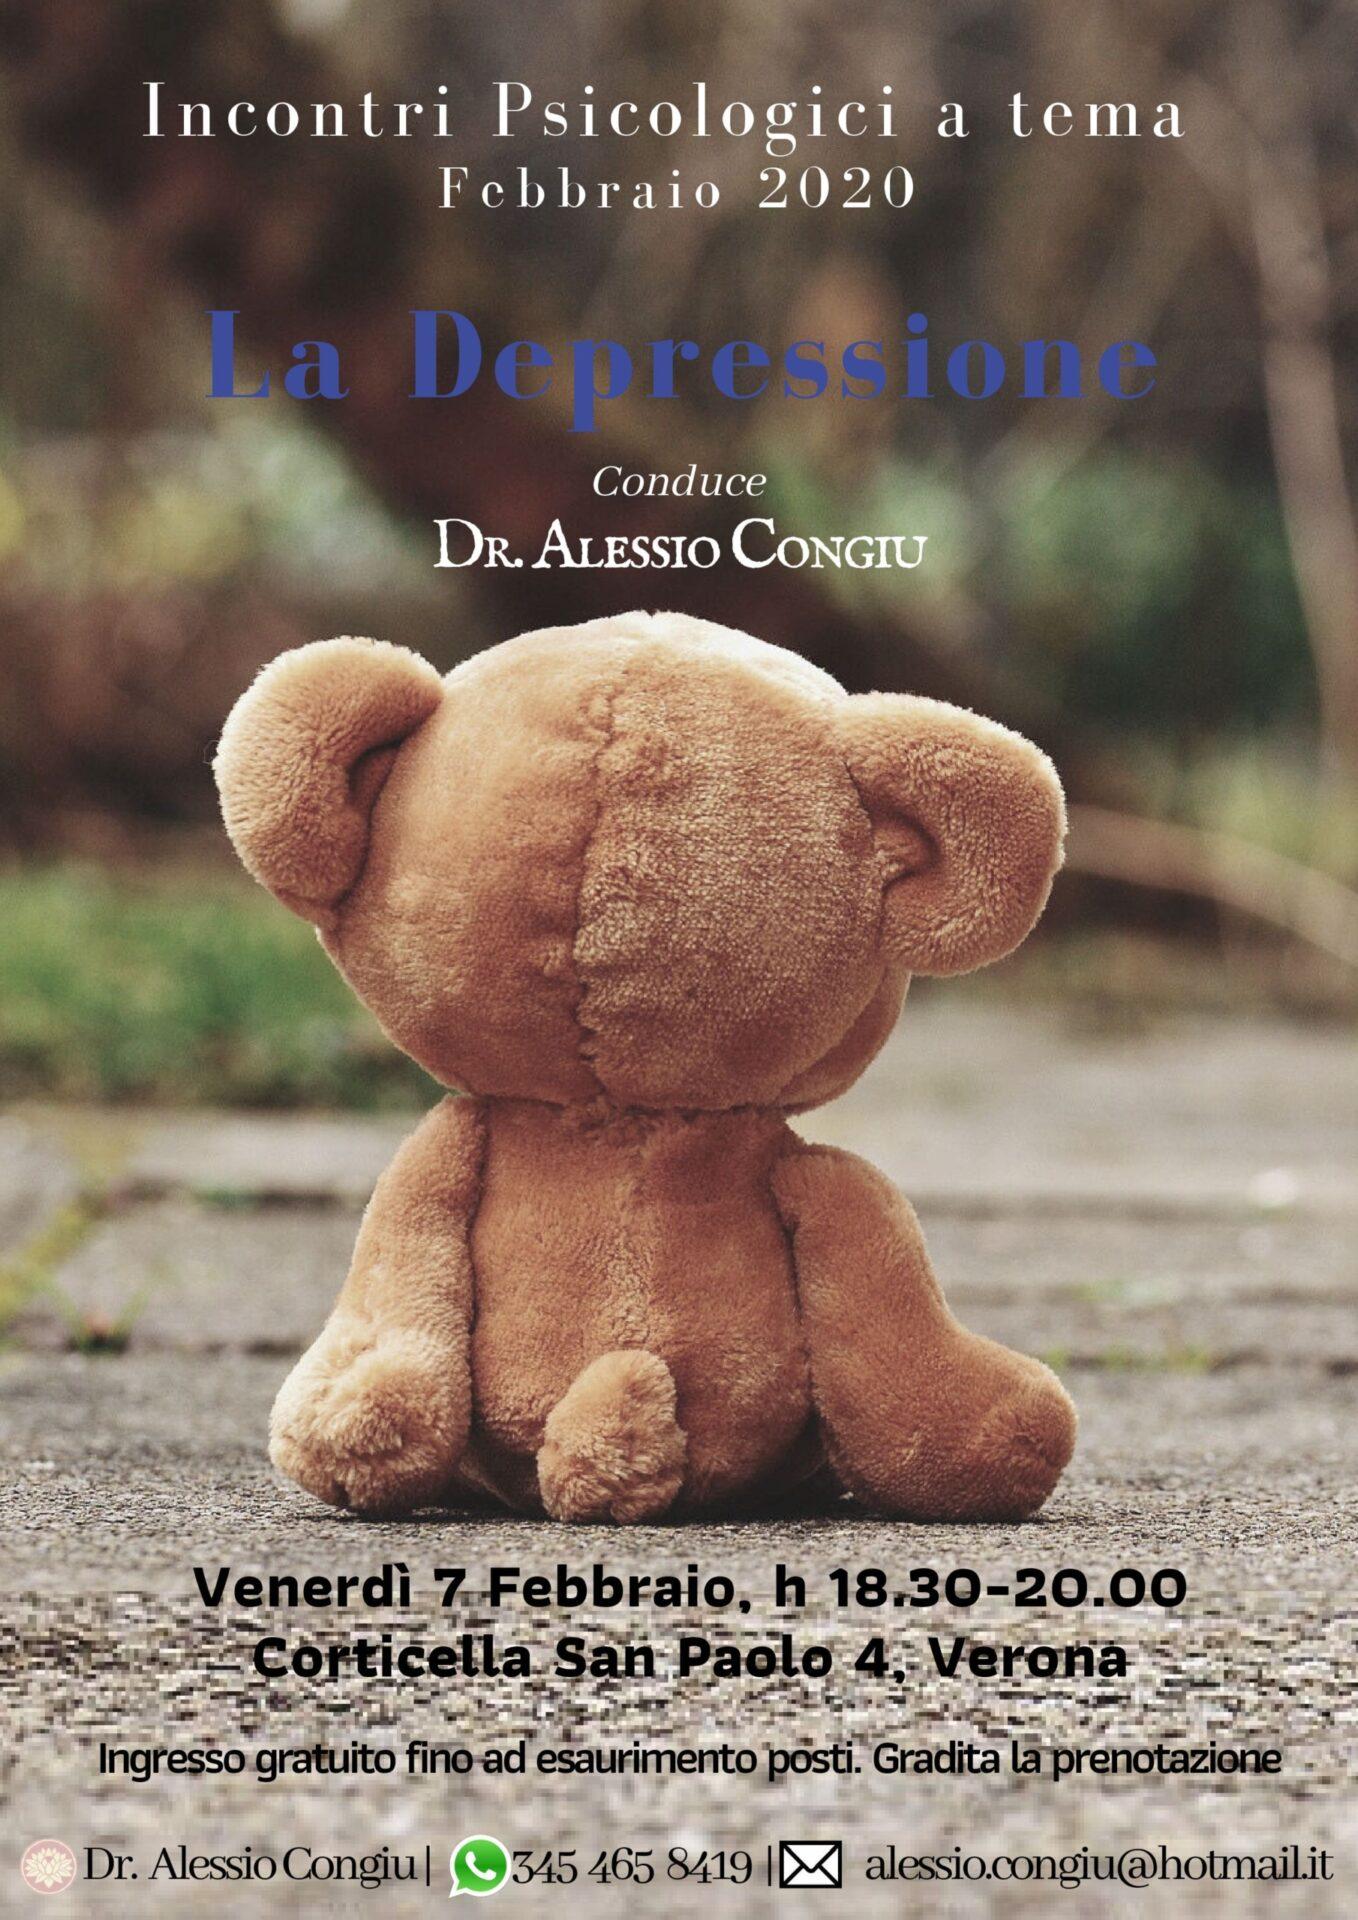 Psicologo a Verona e Vicenza